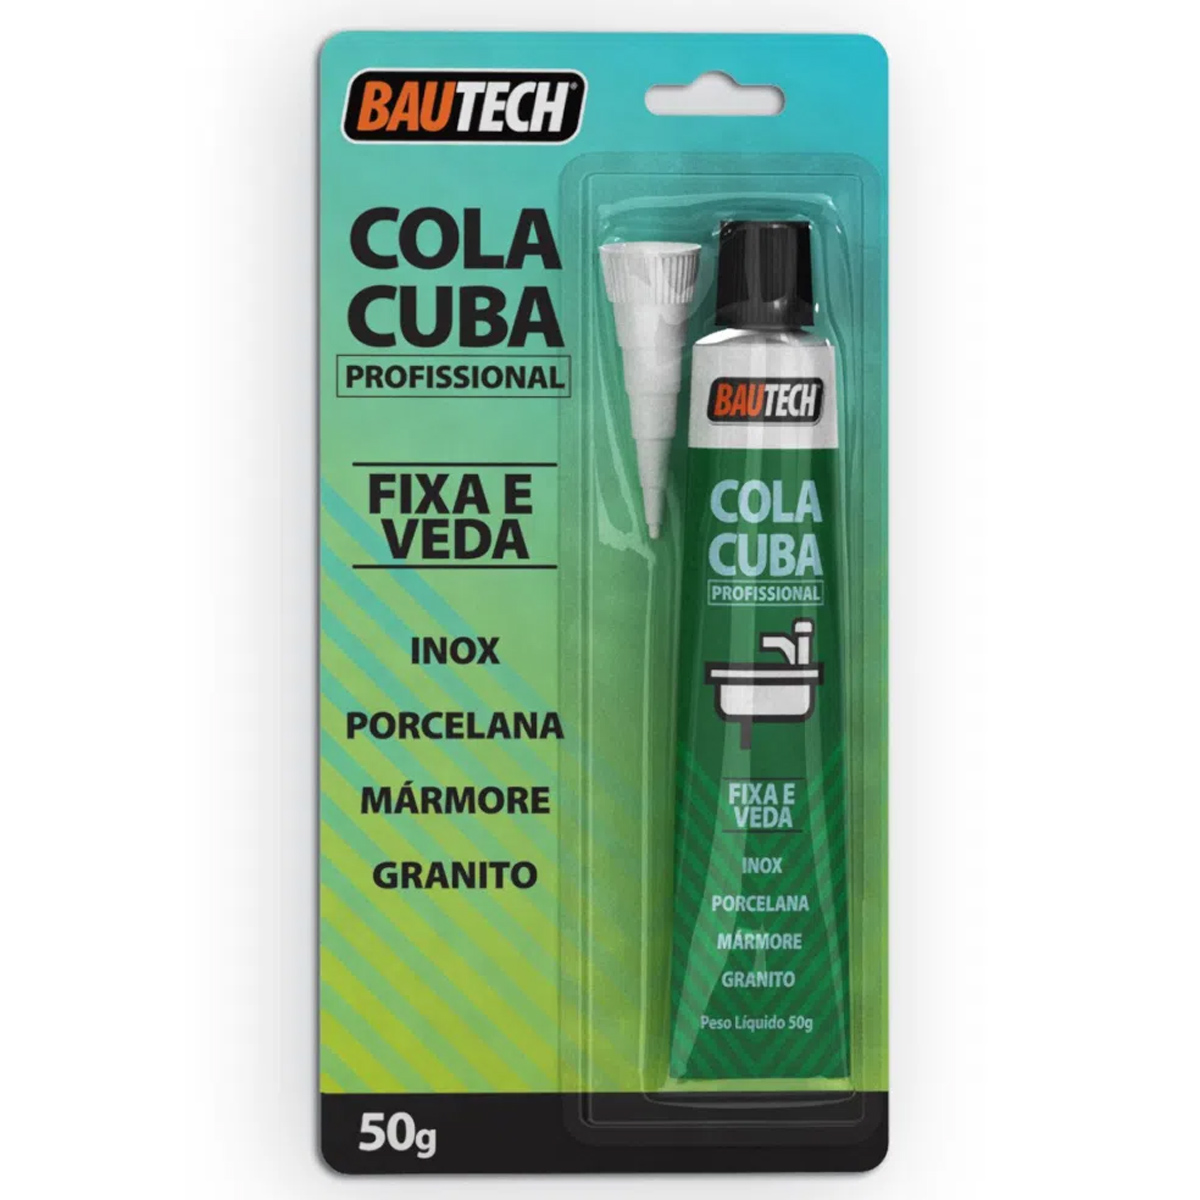 Cola Cuba Fixa e Veda Bautech Bisnaga 50g